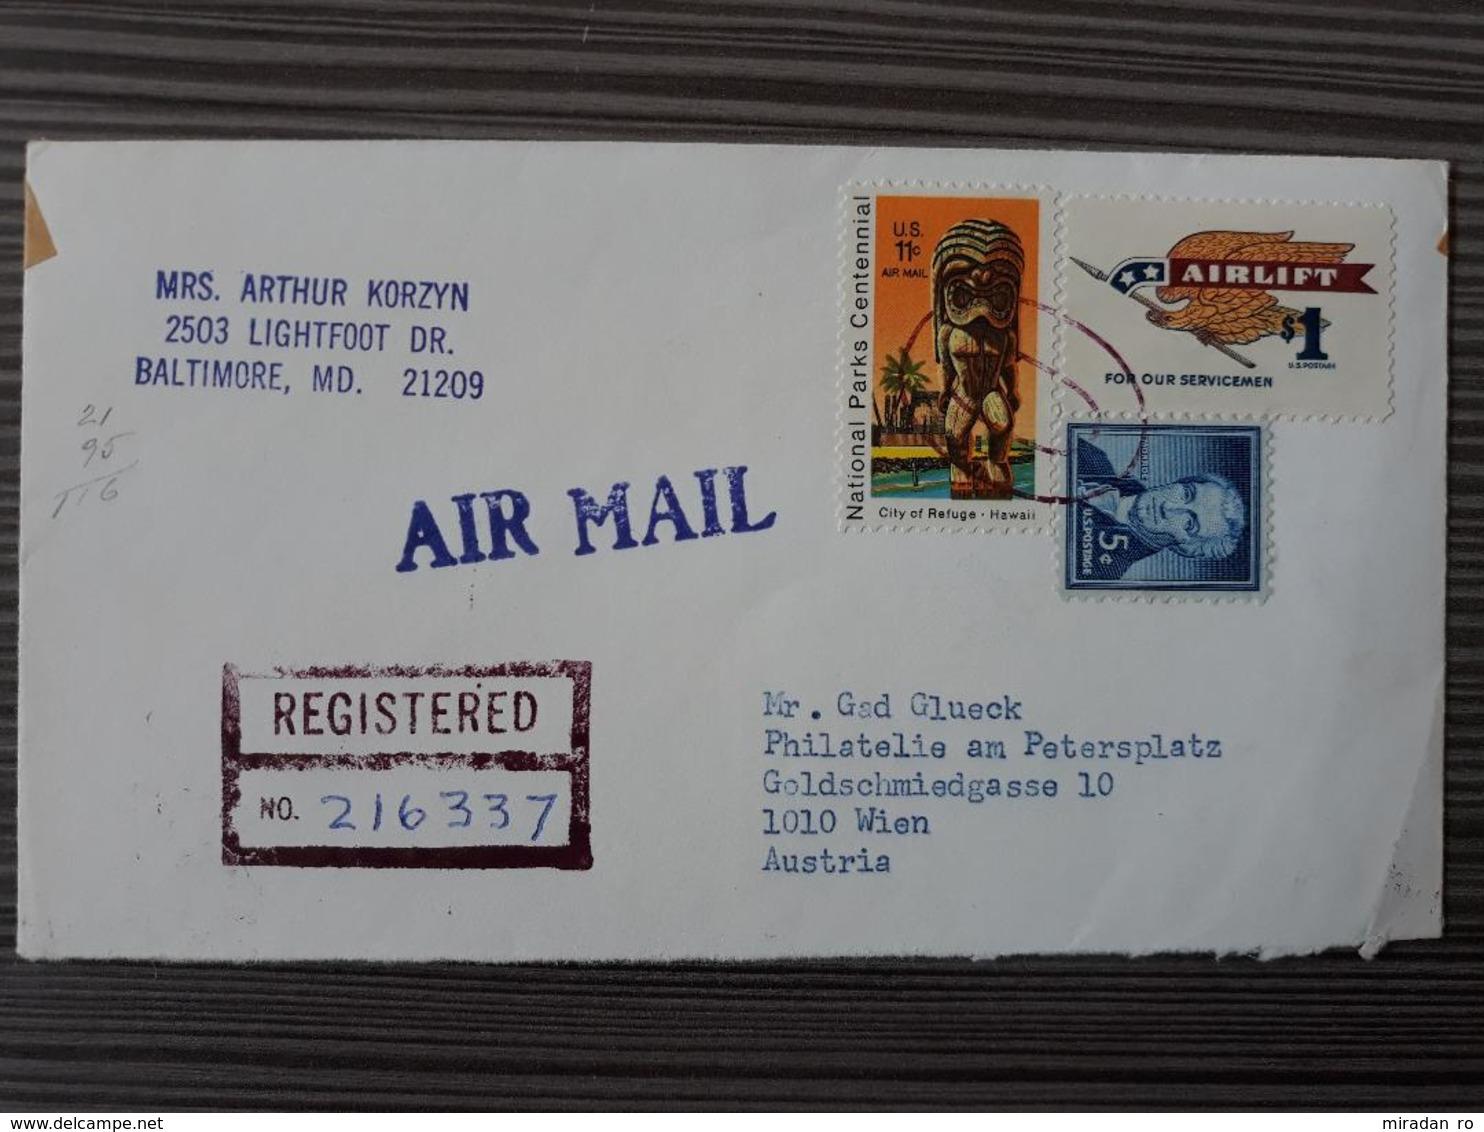 NR 27 - US USA TO AUSTRIA AIRMAIL POSTAL HISTORY POSTCARD 1972 - United States